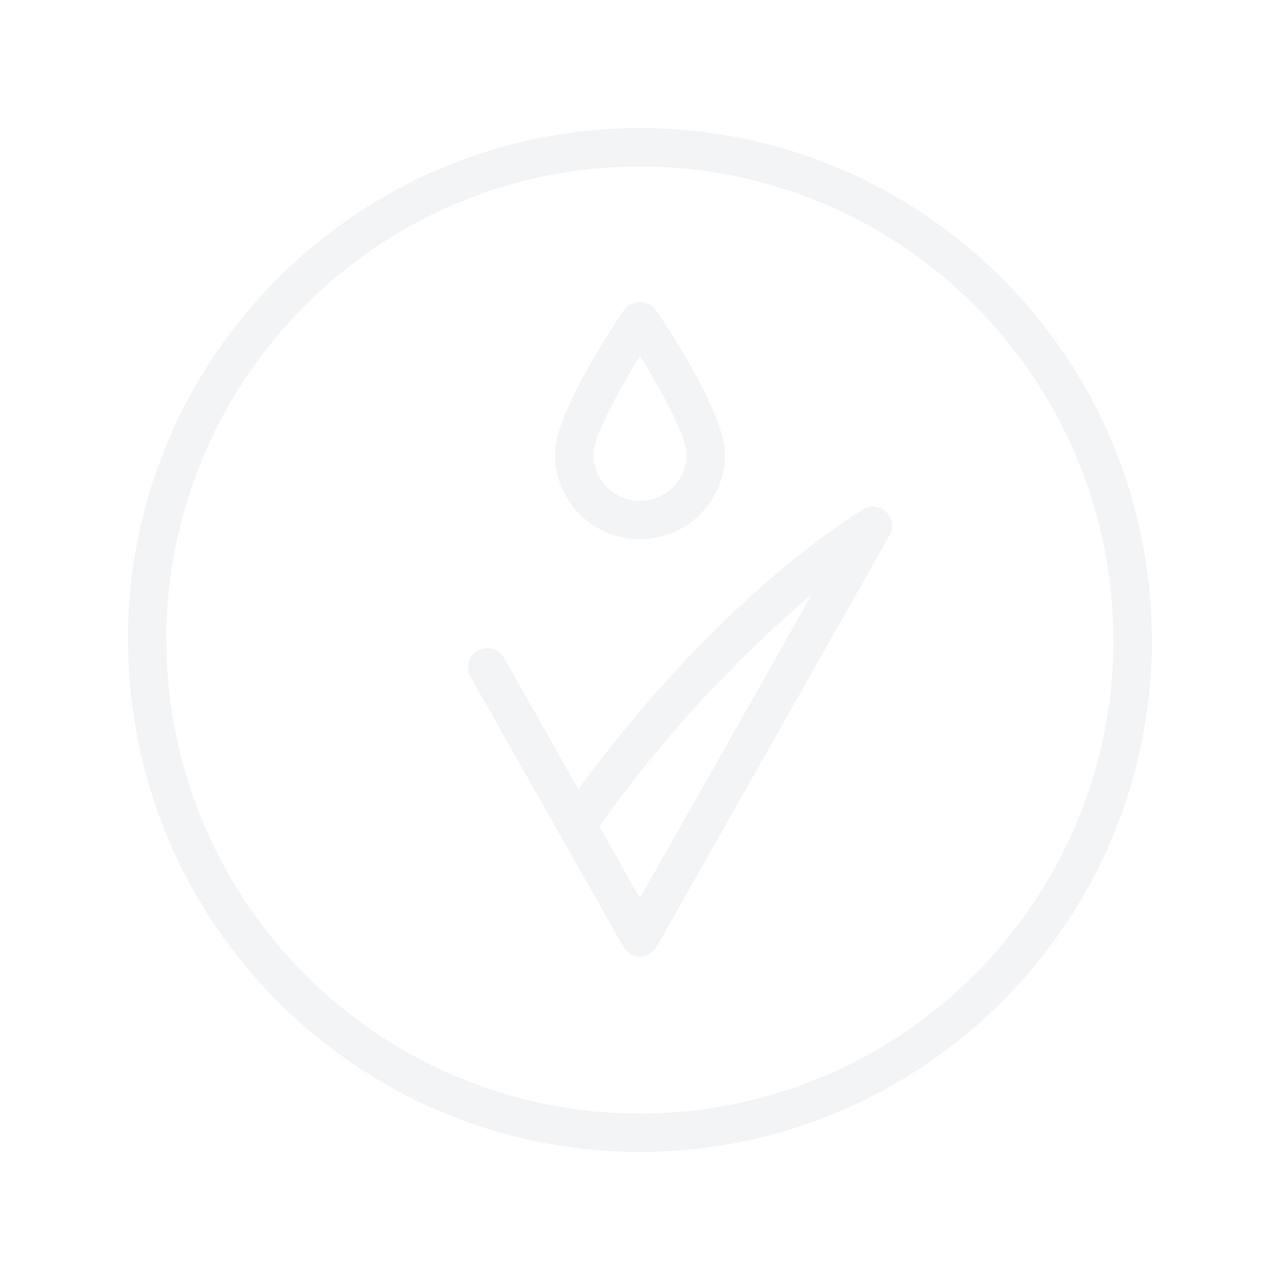 L'Oreal Volume Million Lashes So Couture Mascara Black 9.5ml